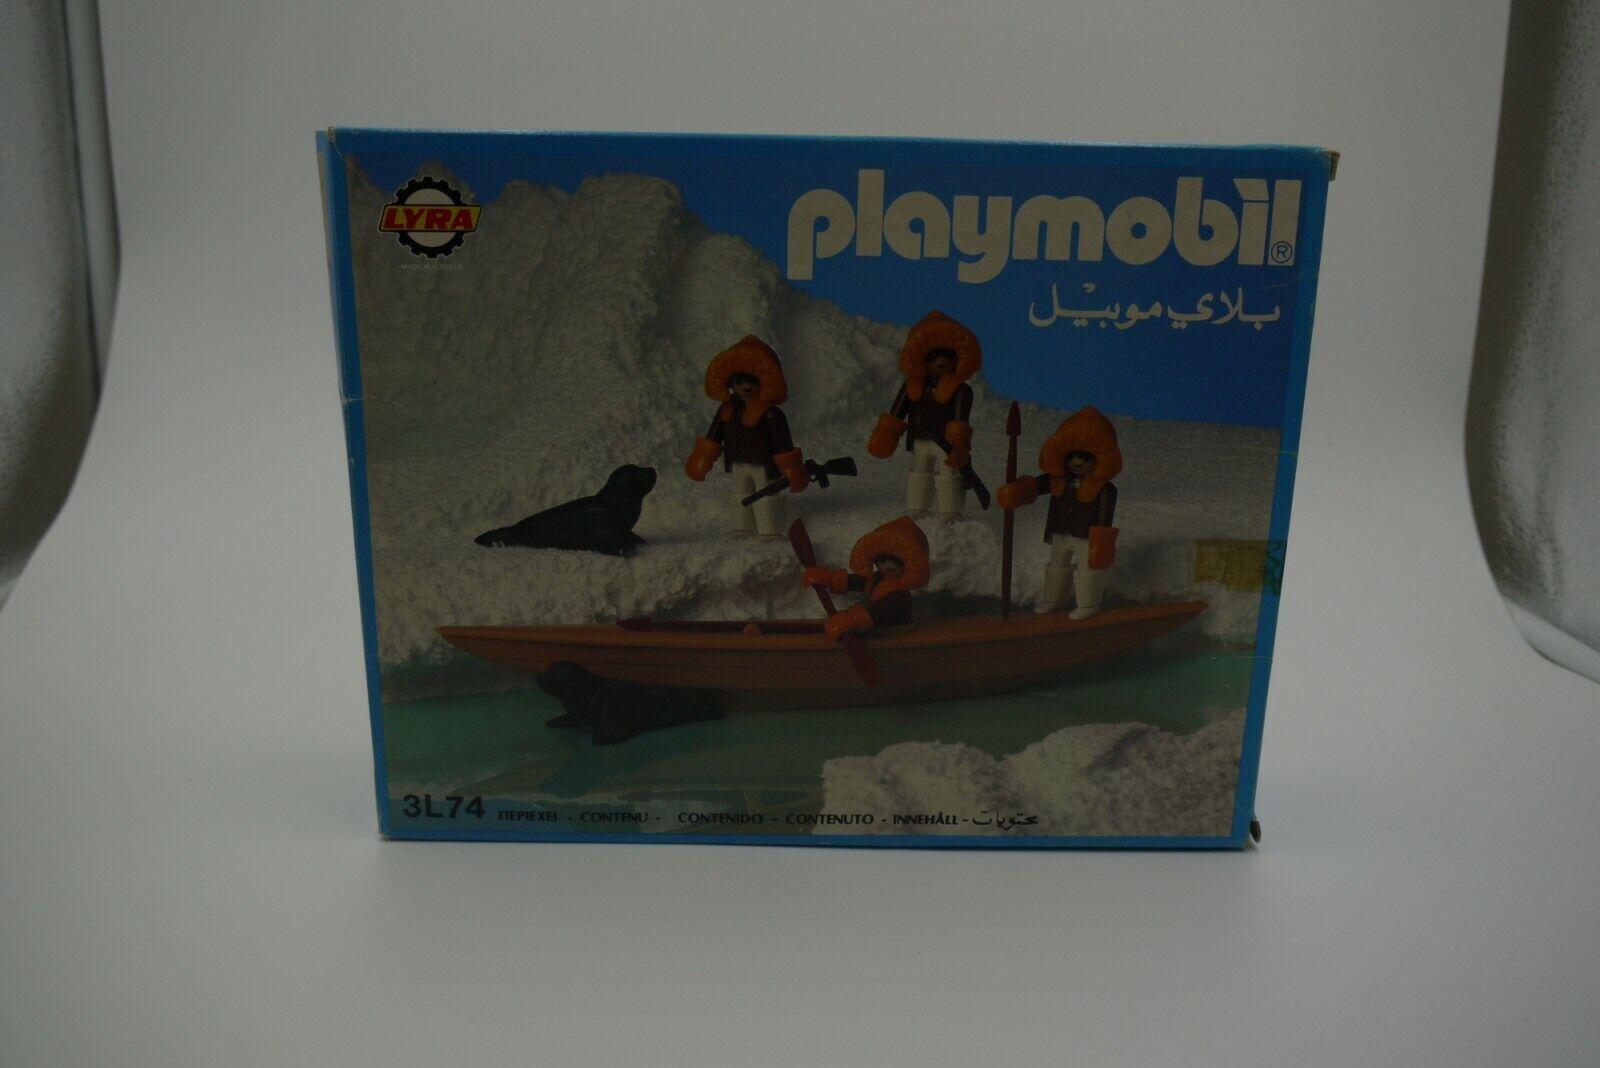 PLAYMOBIL 3L74 GREEK LYRA ESKIMO HUNTERS KAYAK CANOE FIGURE SET MIB